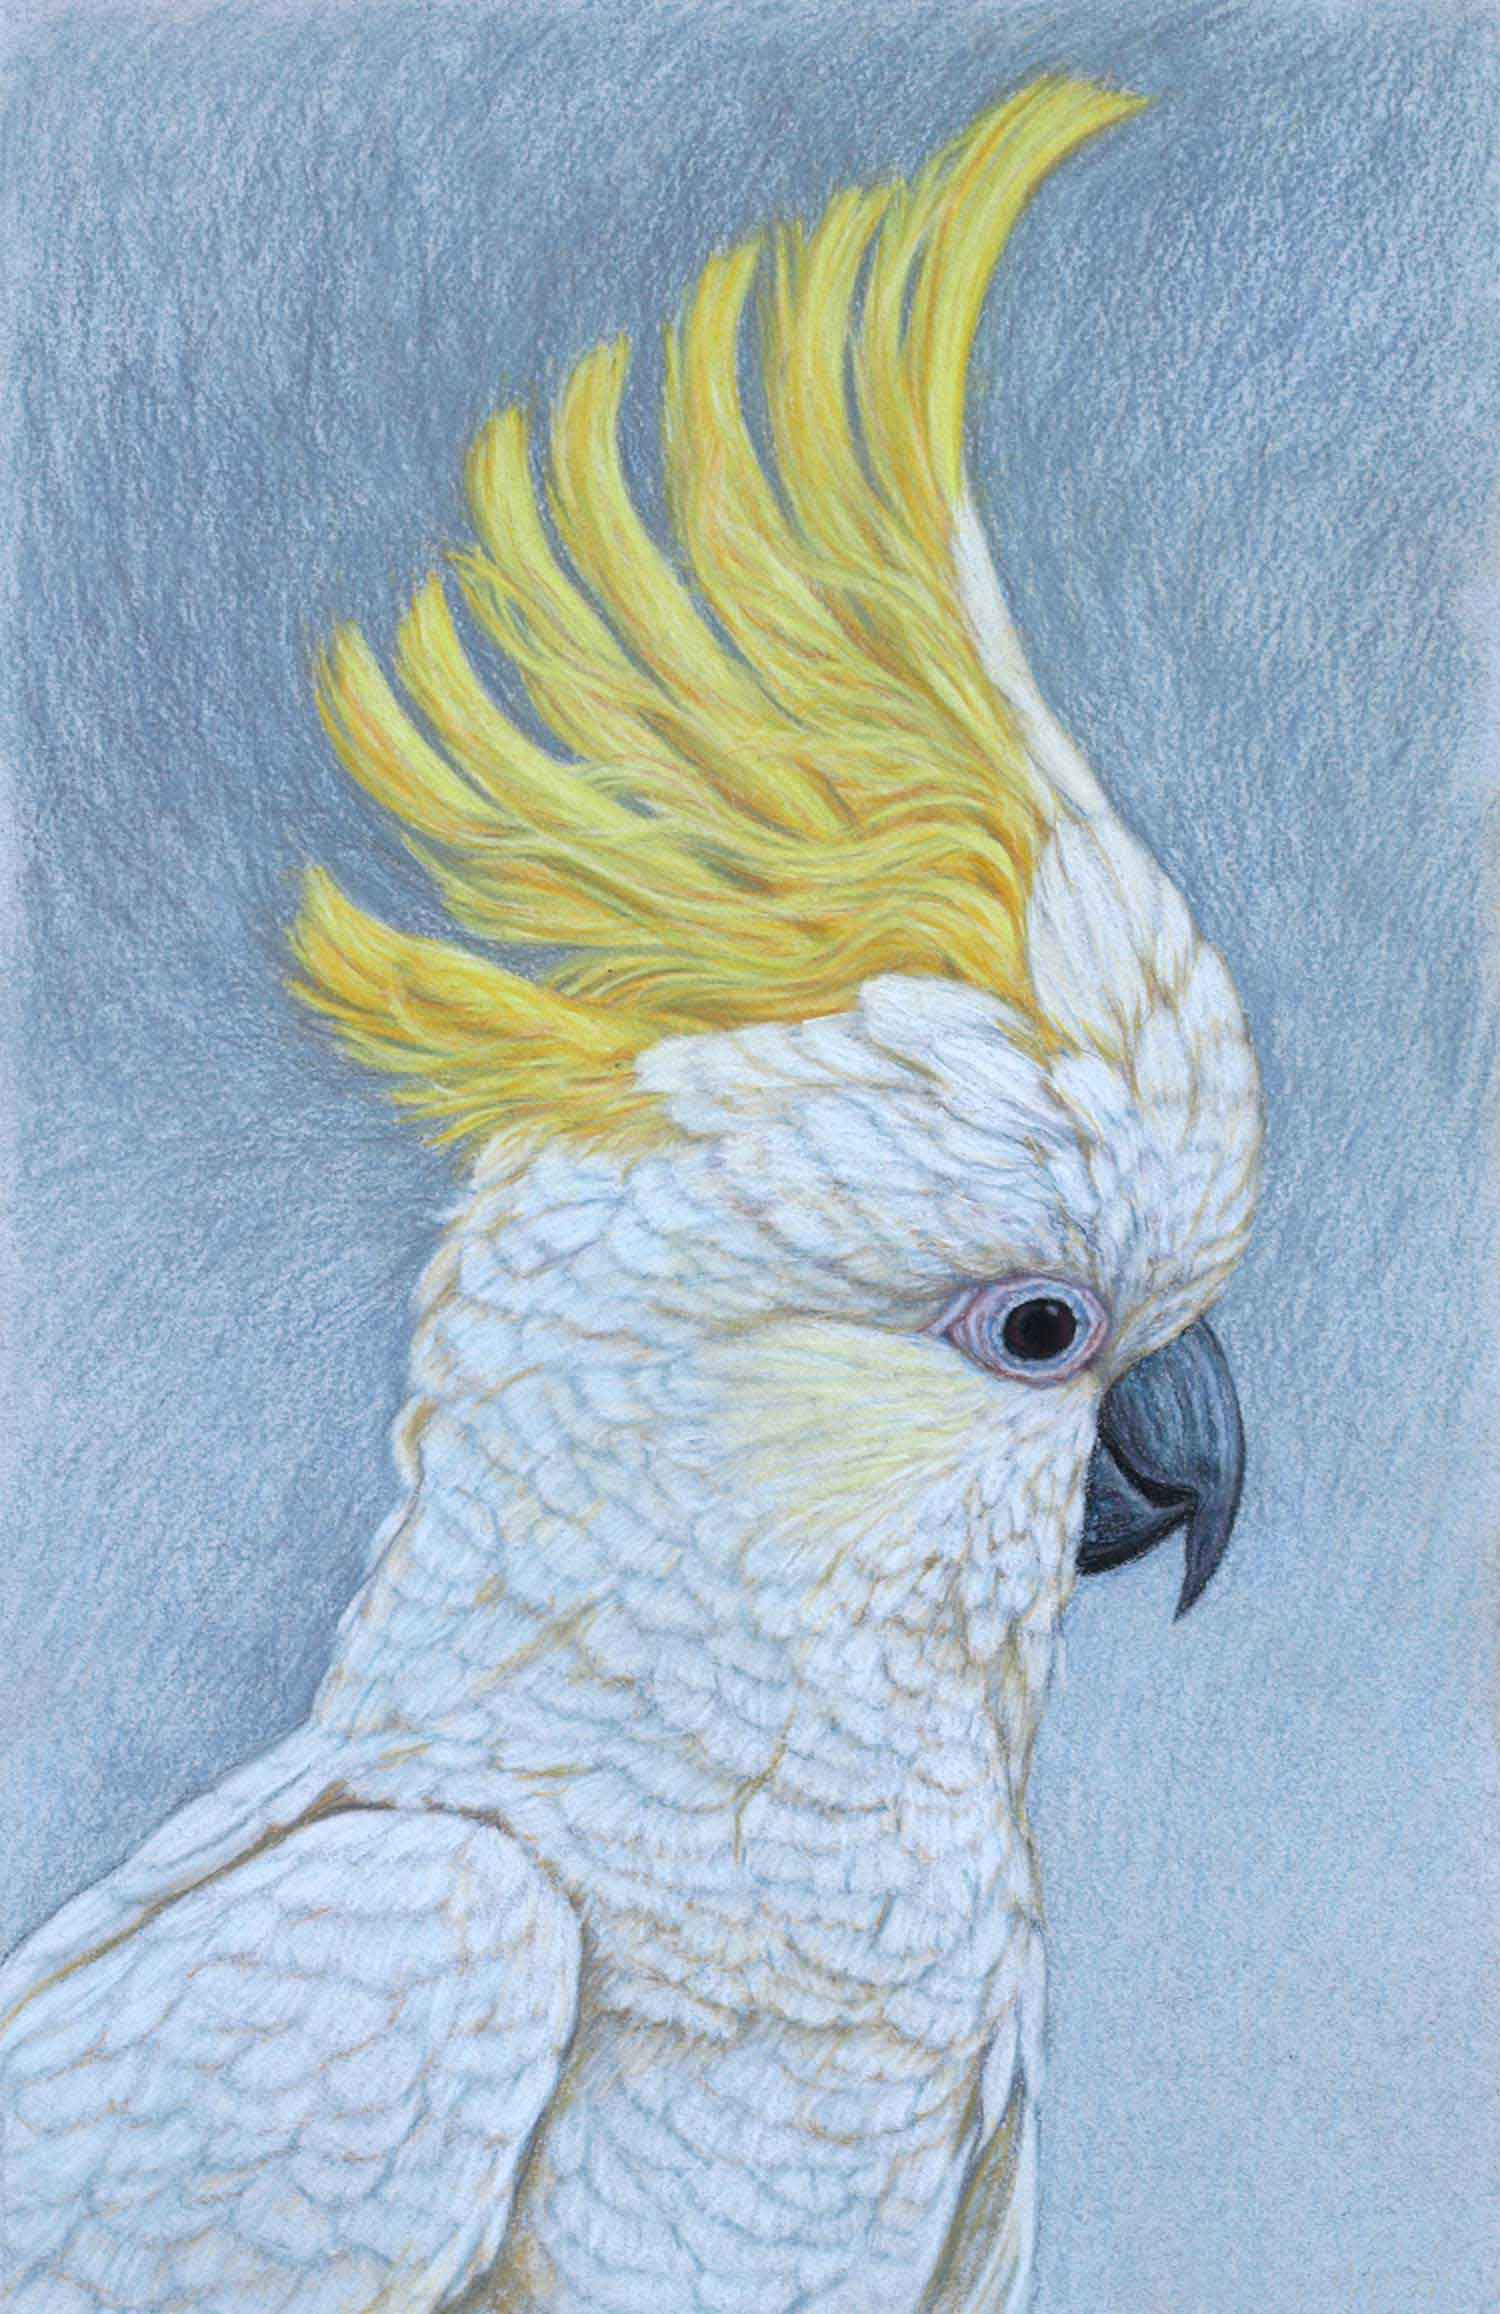 Sulphur Crested Cockatoo III 41.5 x 27 cm  Pastel on handmade paper  SOLD